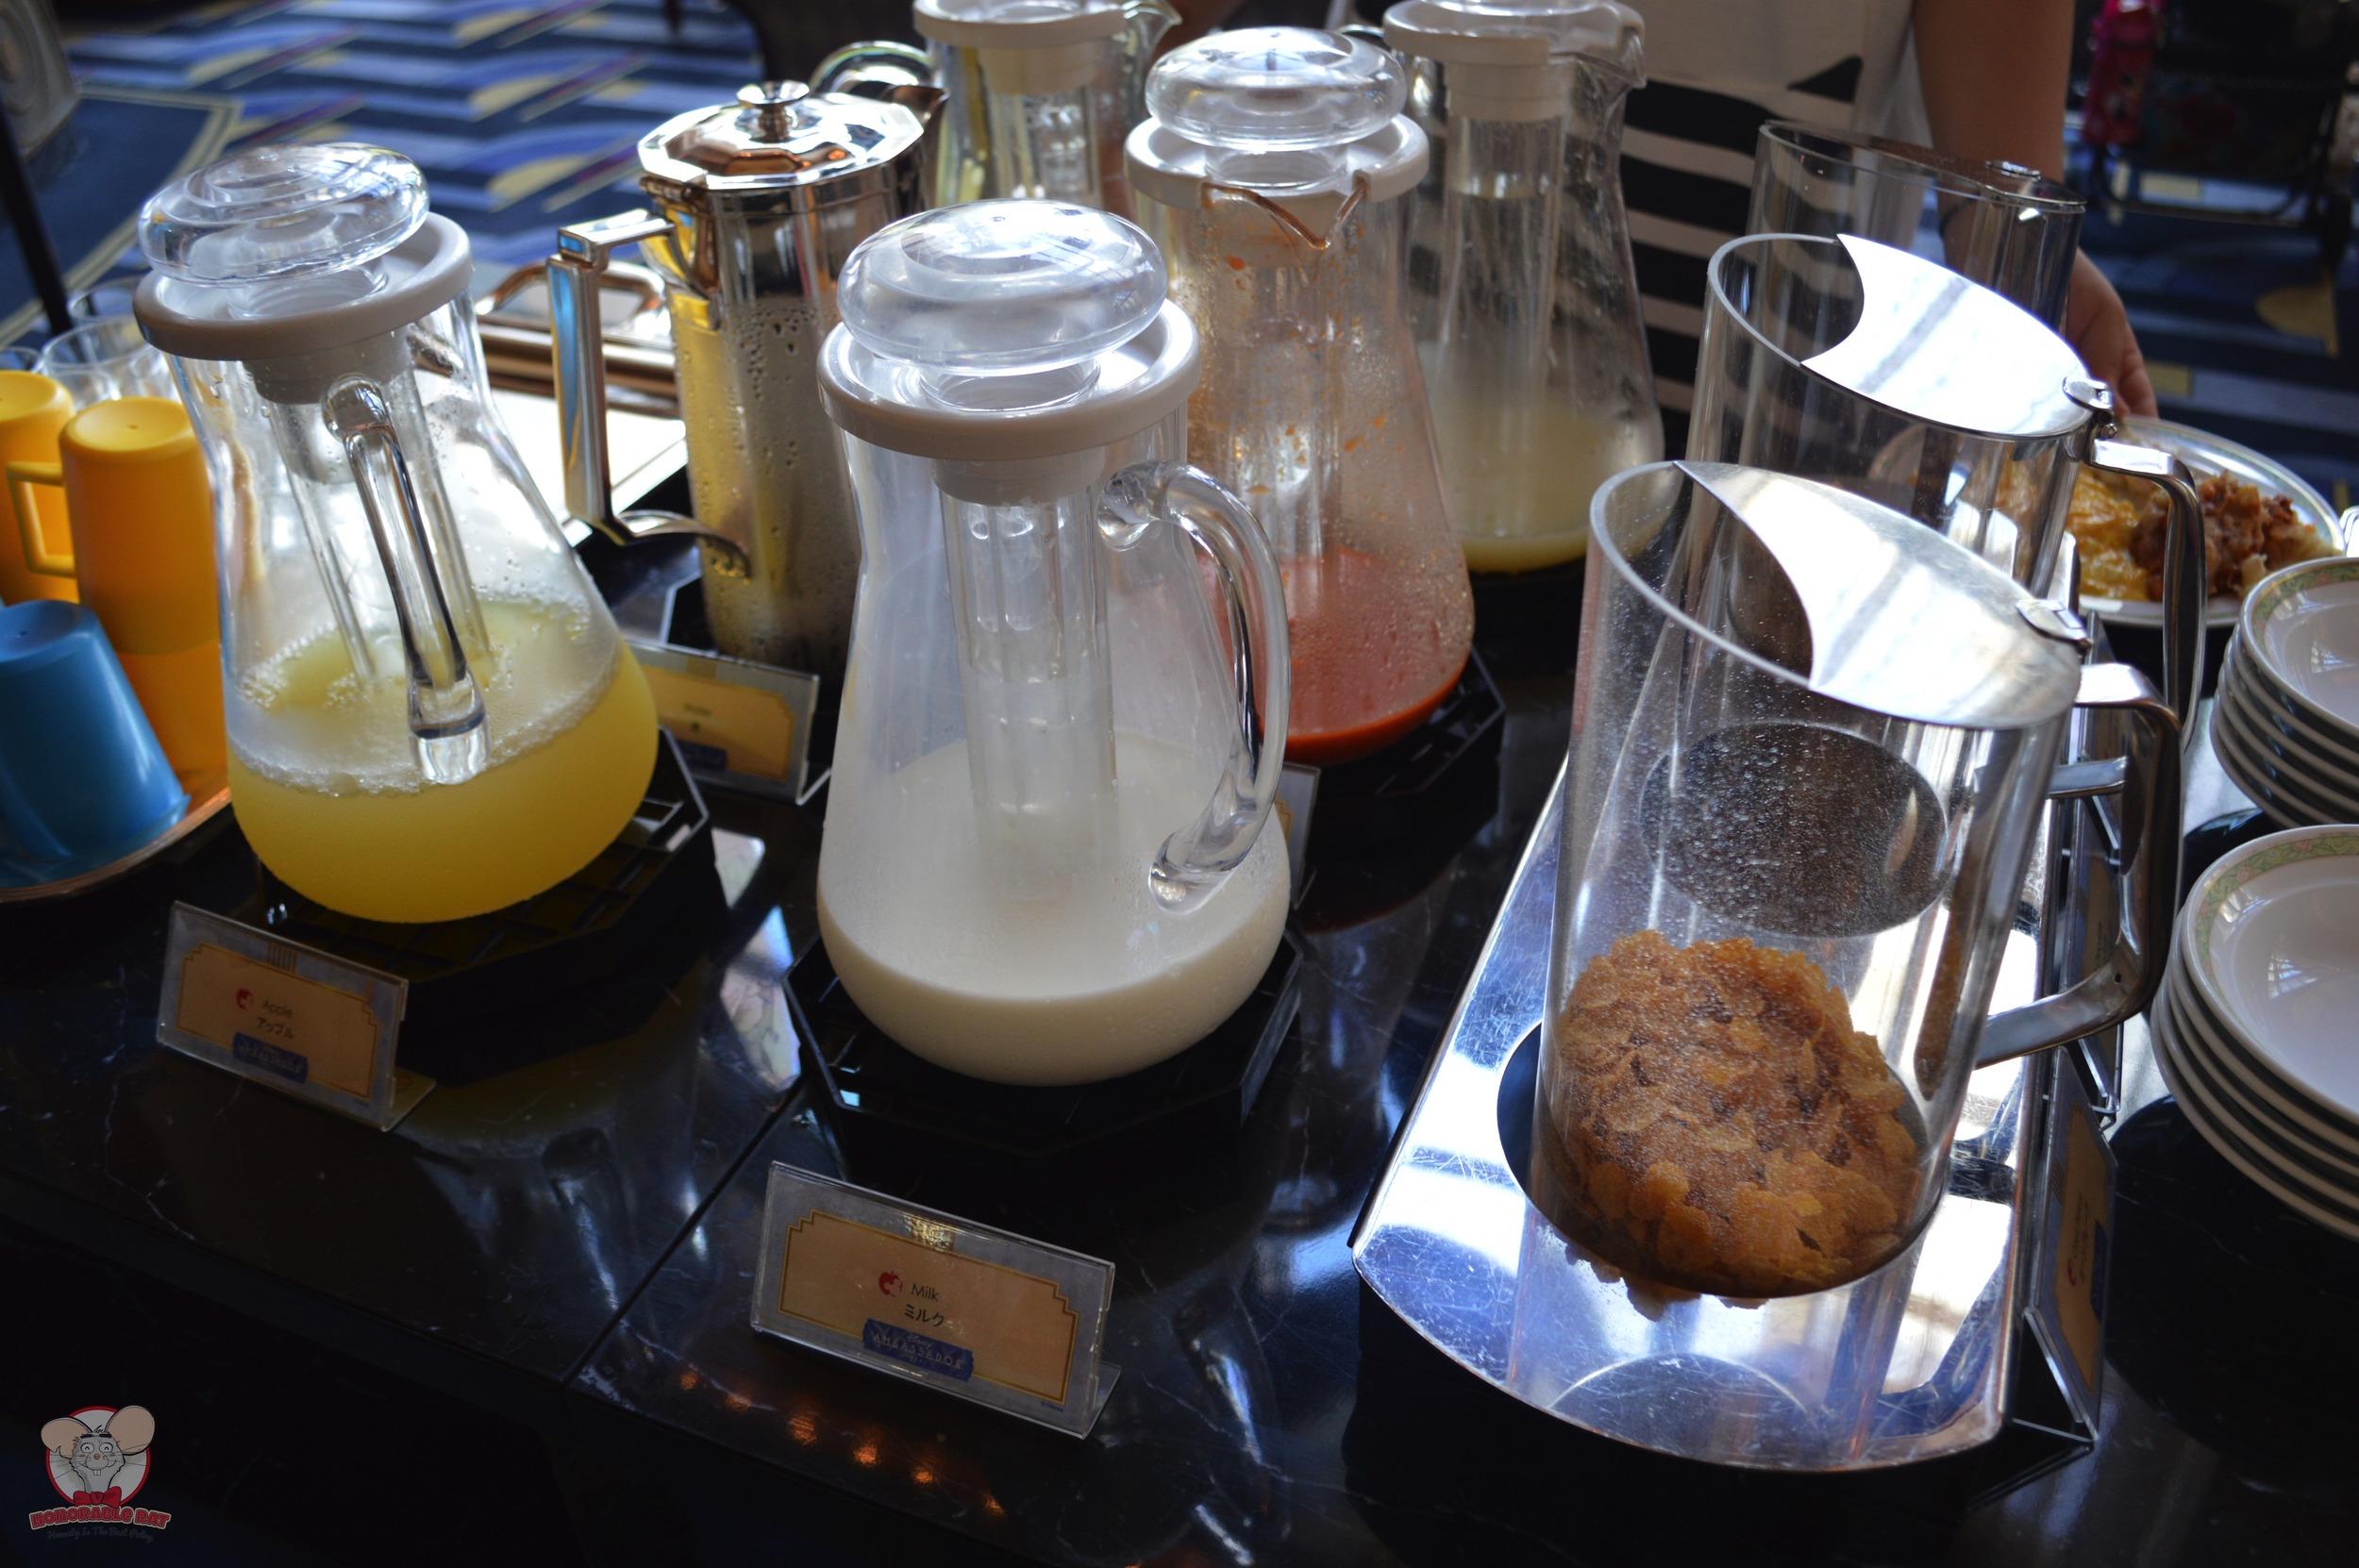 Apple juice and milk